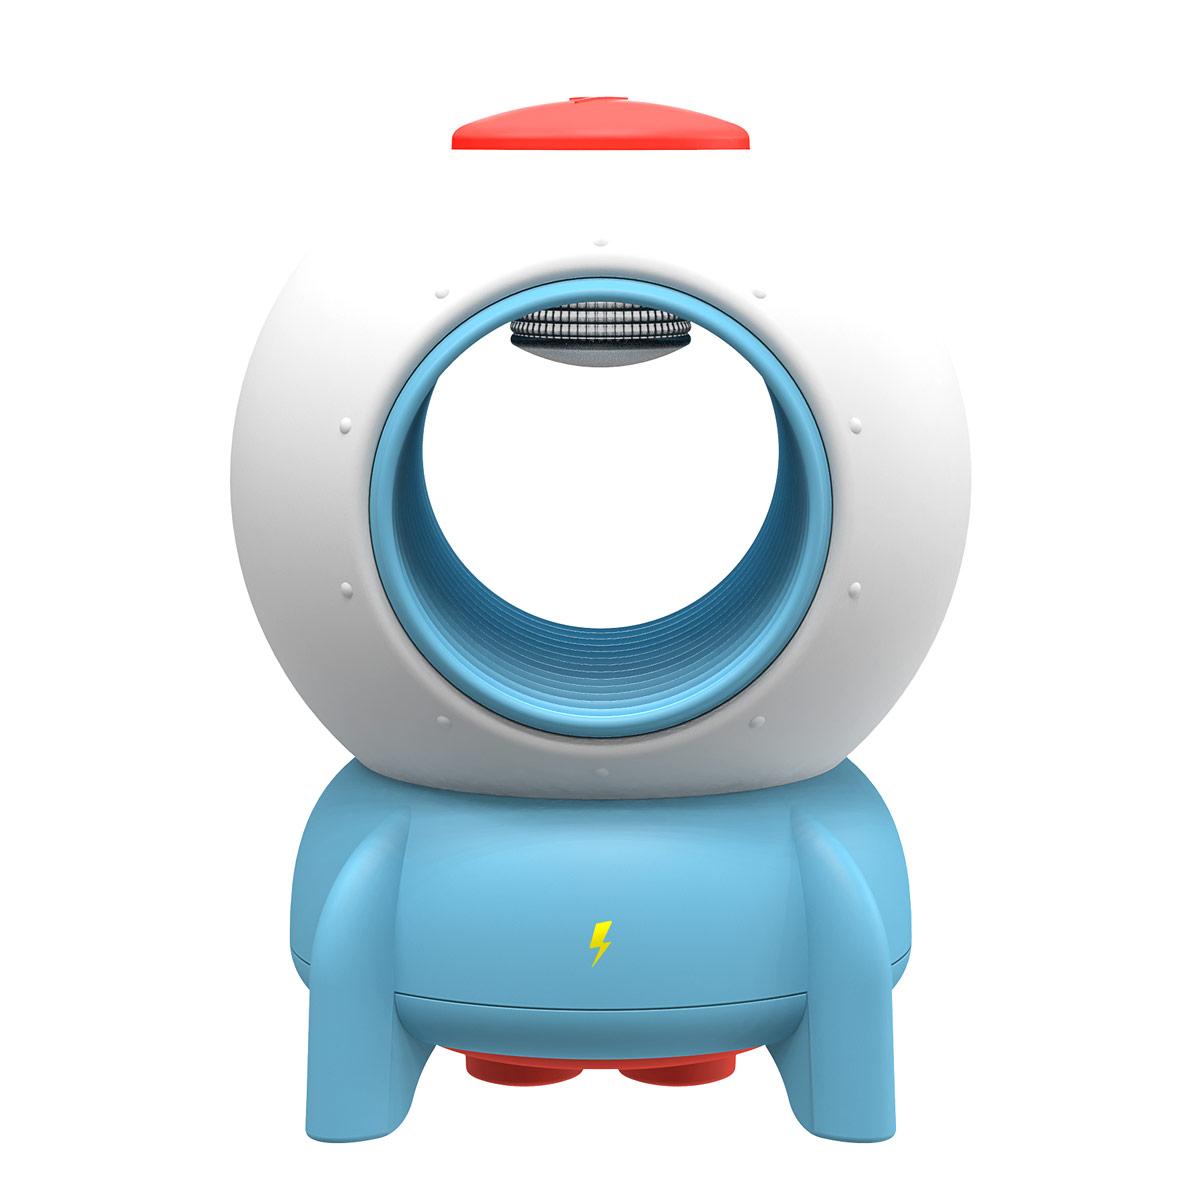 bcase火箭灭蚊灯神器家用室内孕妇婴儿物理灭蚊灯静音驱蚊器 1件